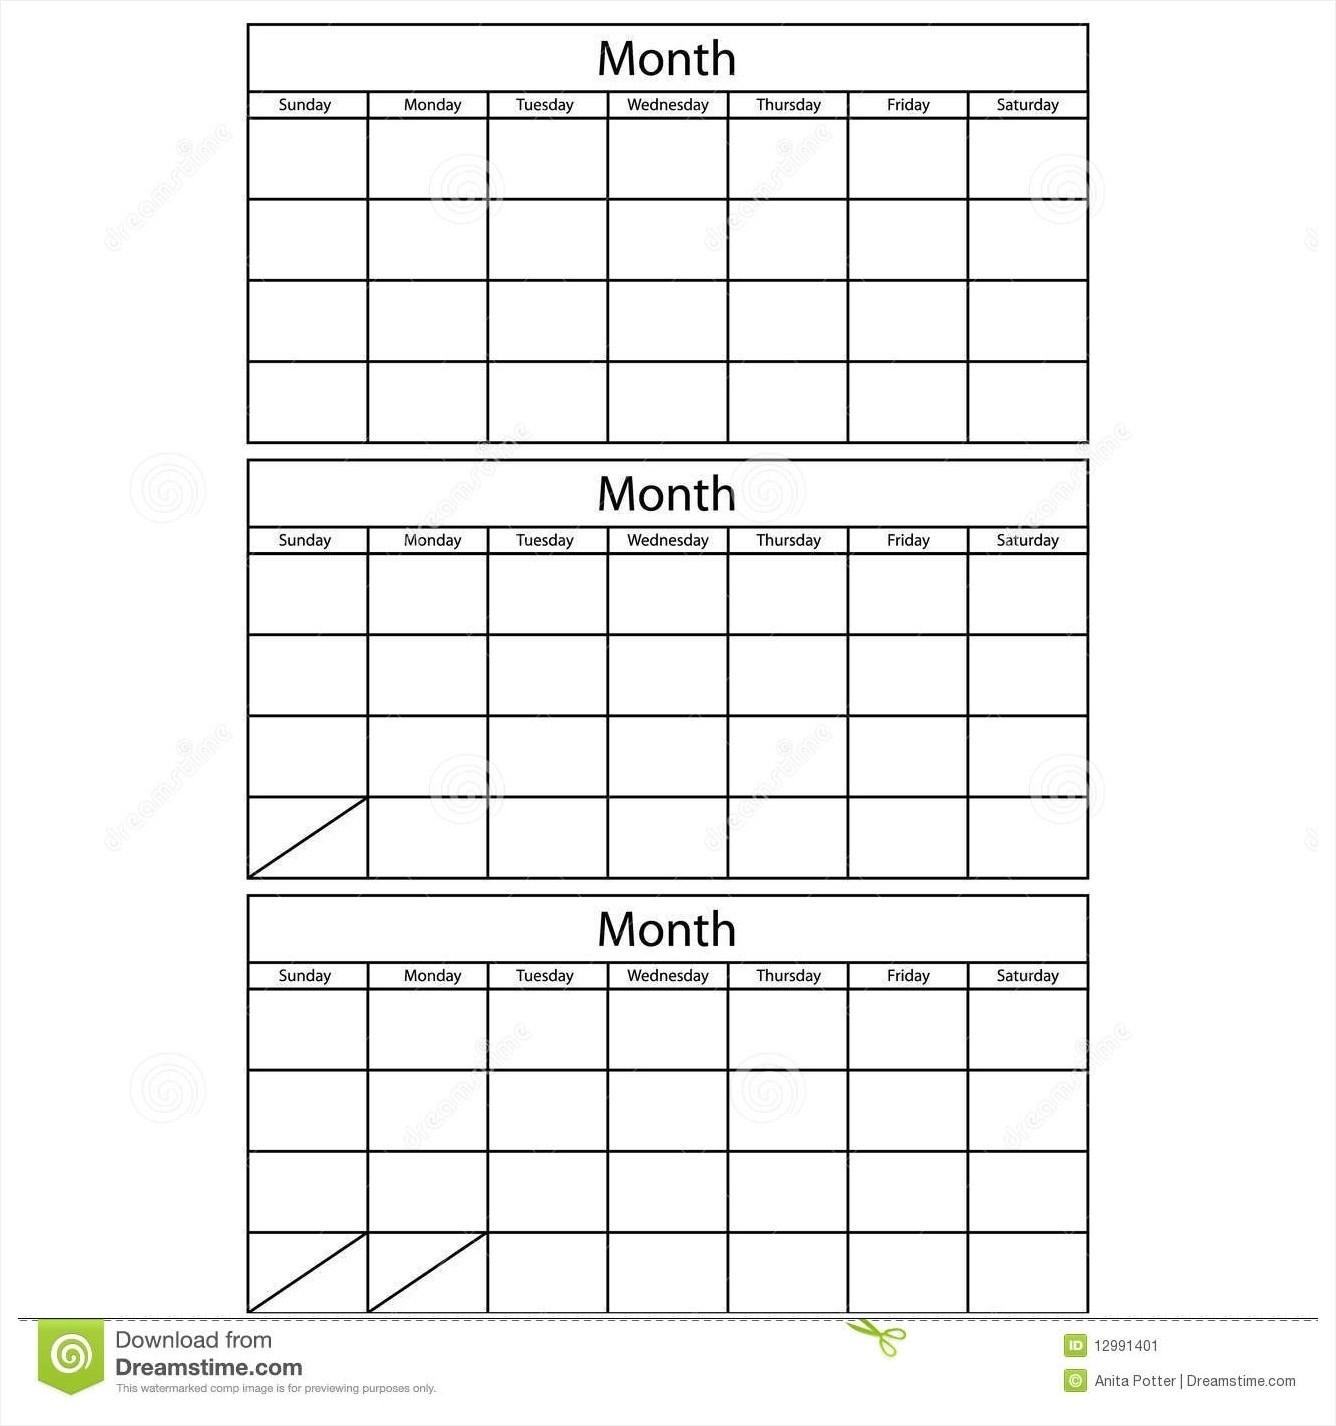 3 Month Calendar Template Word Printable 2017 Blank April Calendar within 3 Month Calendar Template Printable Free